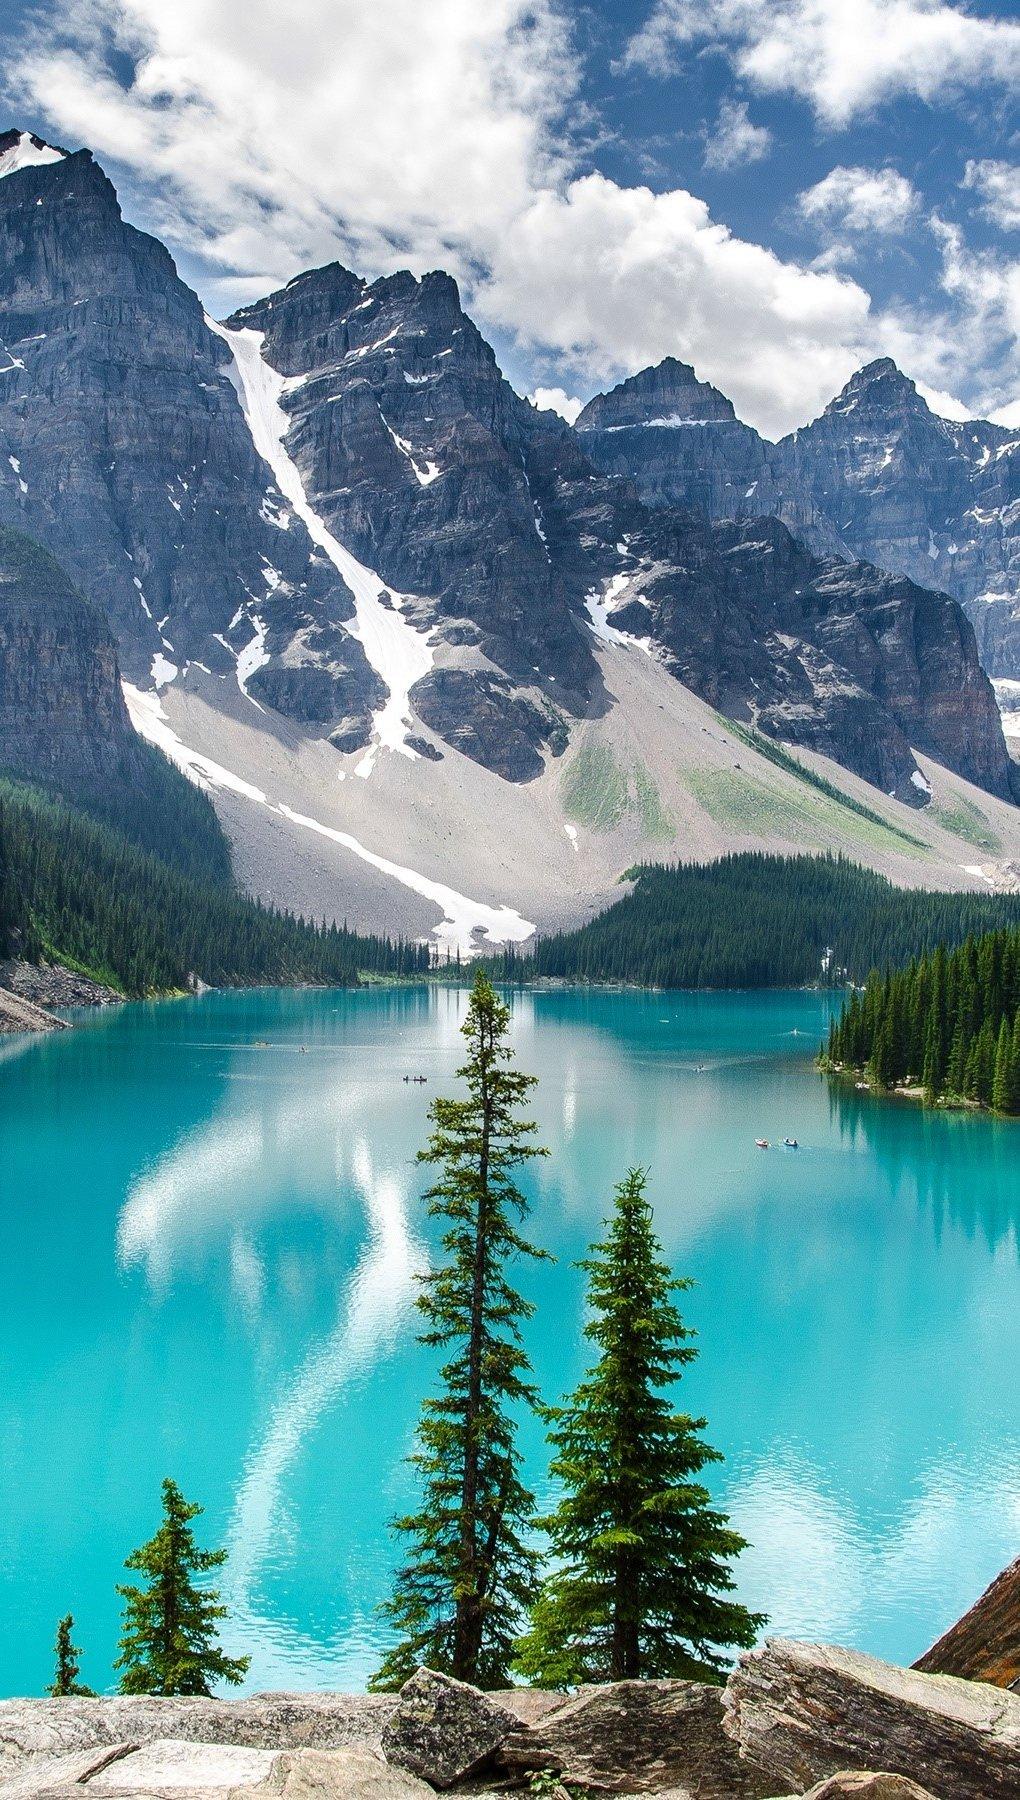 Wallpaper Moraine Lake in Banff National Park Vertical